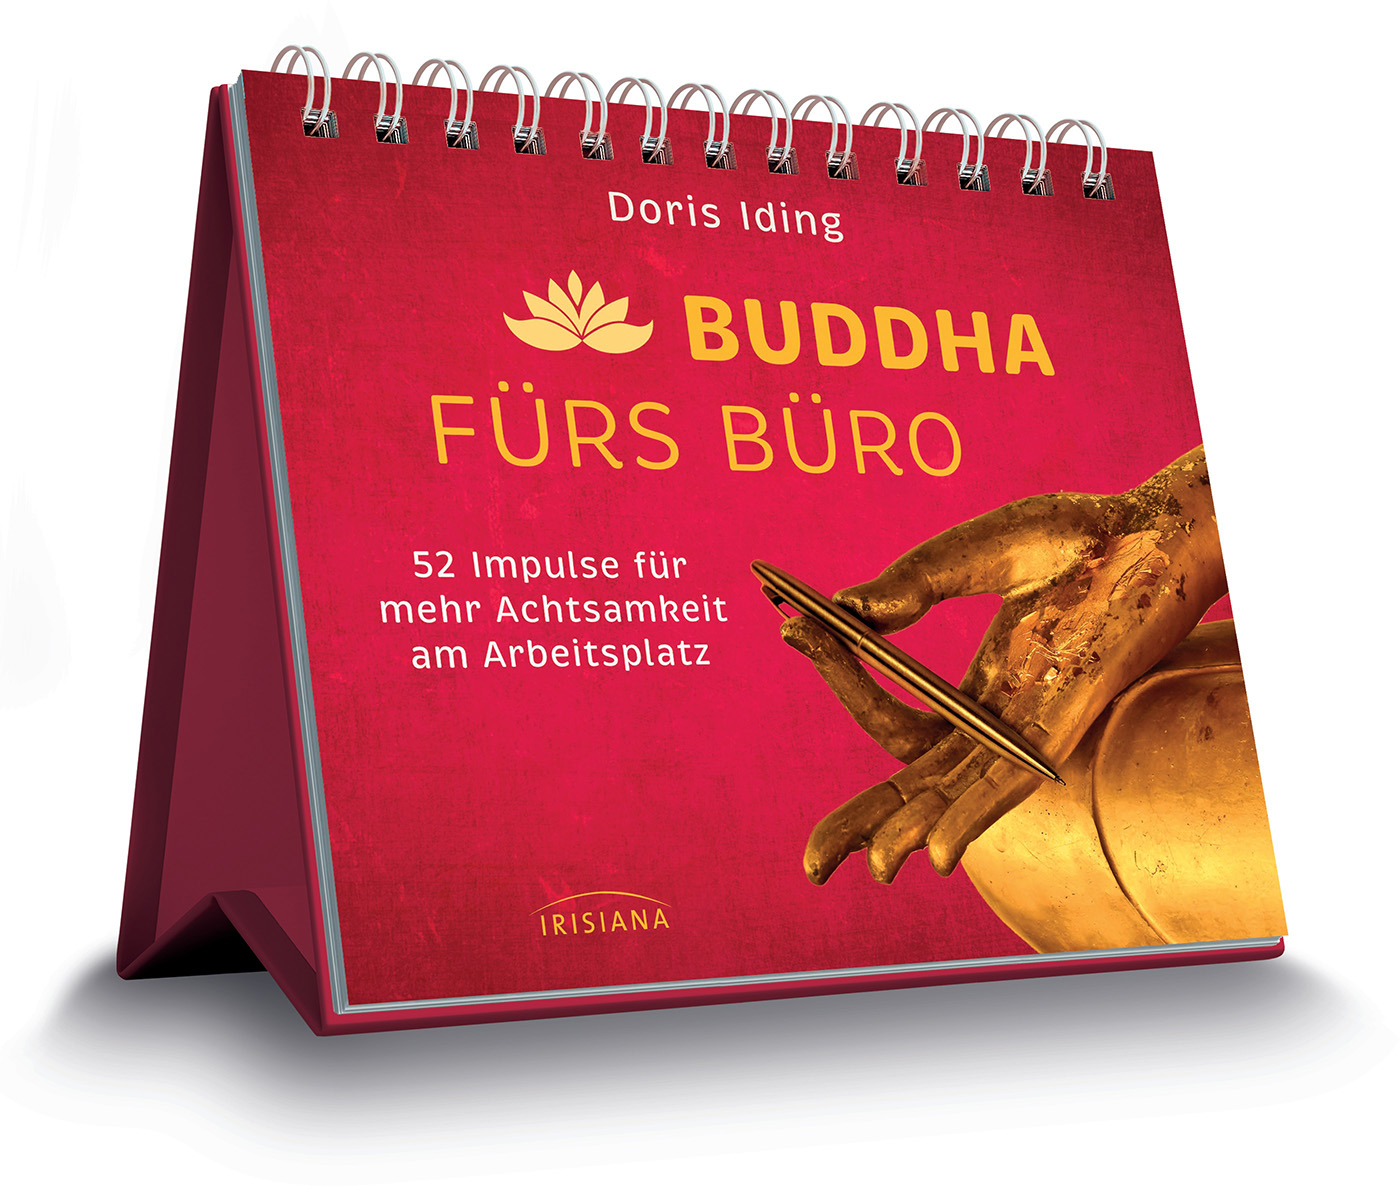 Buddha fürs Büro von Doris Iding im YOGISHOP kaufen | Yoga ...